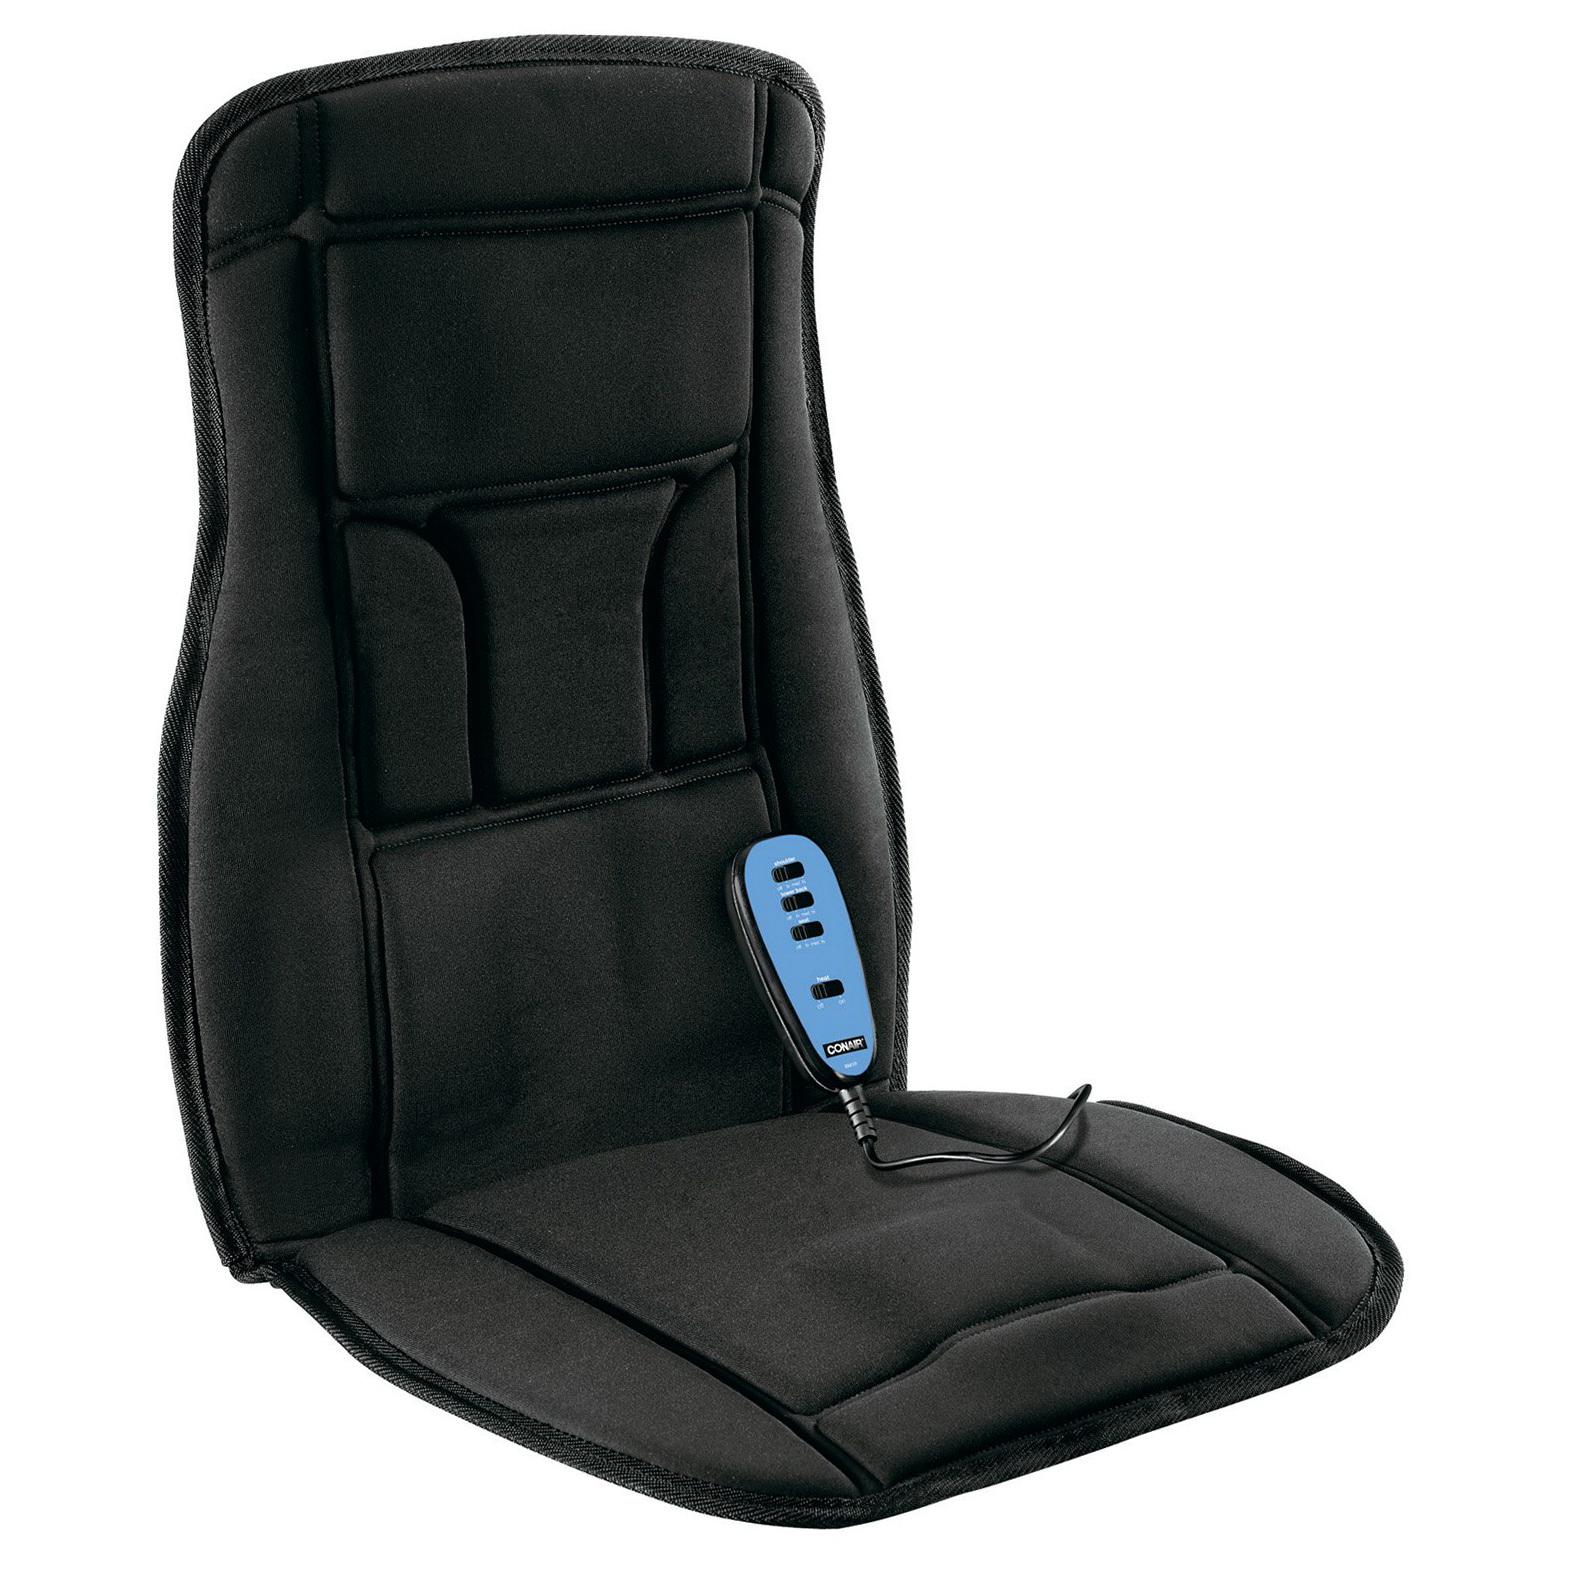 Heated Seat Cushion For Stadium